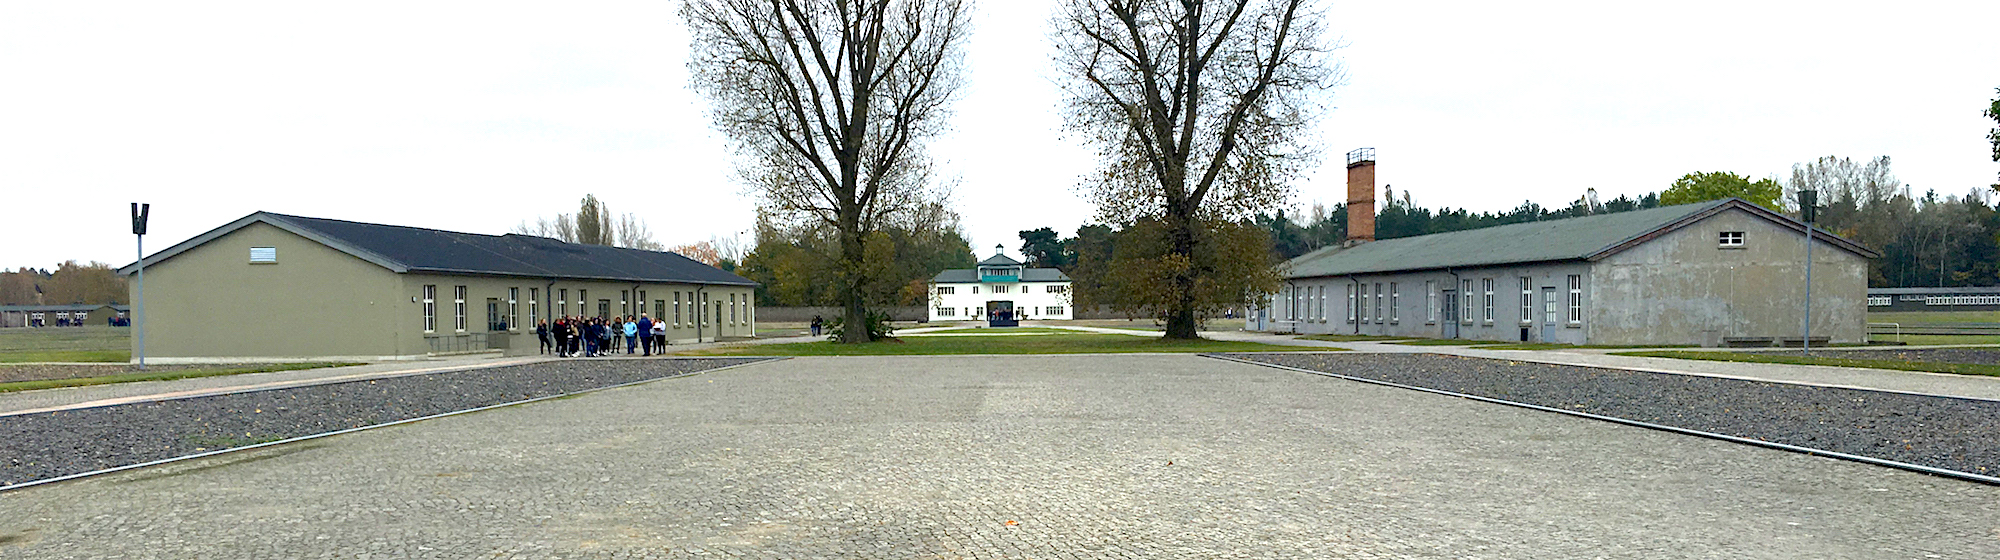 Sachsenhausen concentration camp: barracks